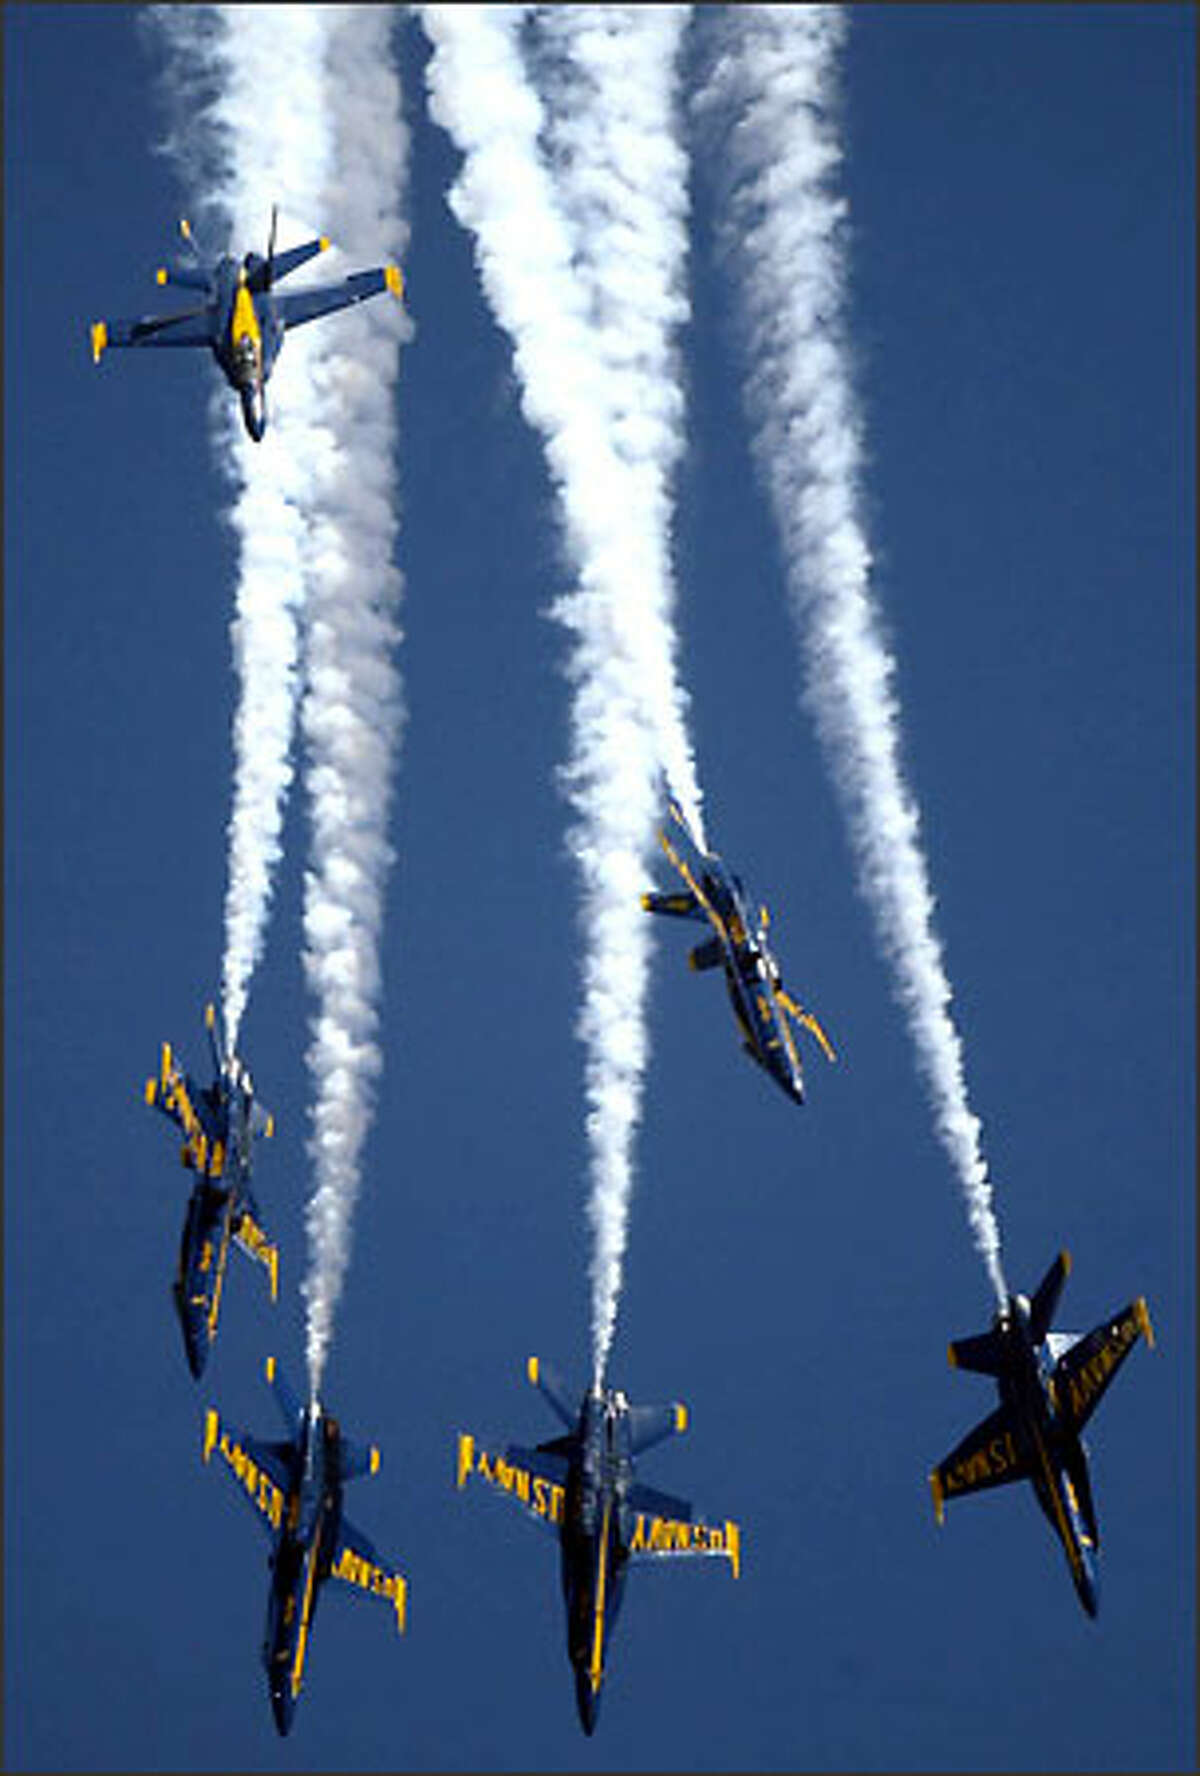 The U.S. Navy's Blue Angels precision aerobatics team heads straight down toward Lake Washington at Seafair.